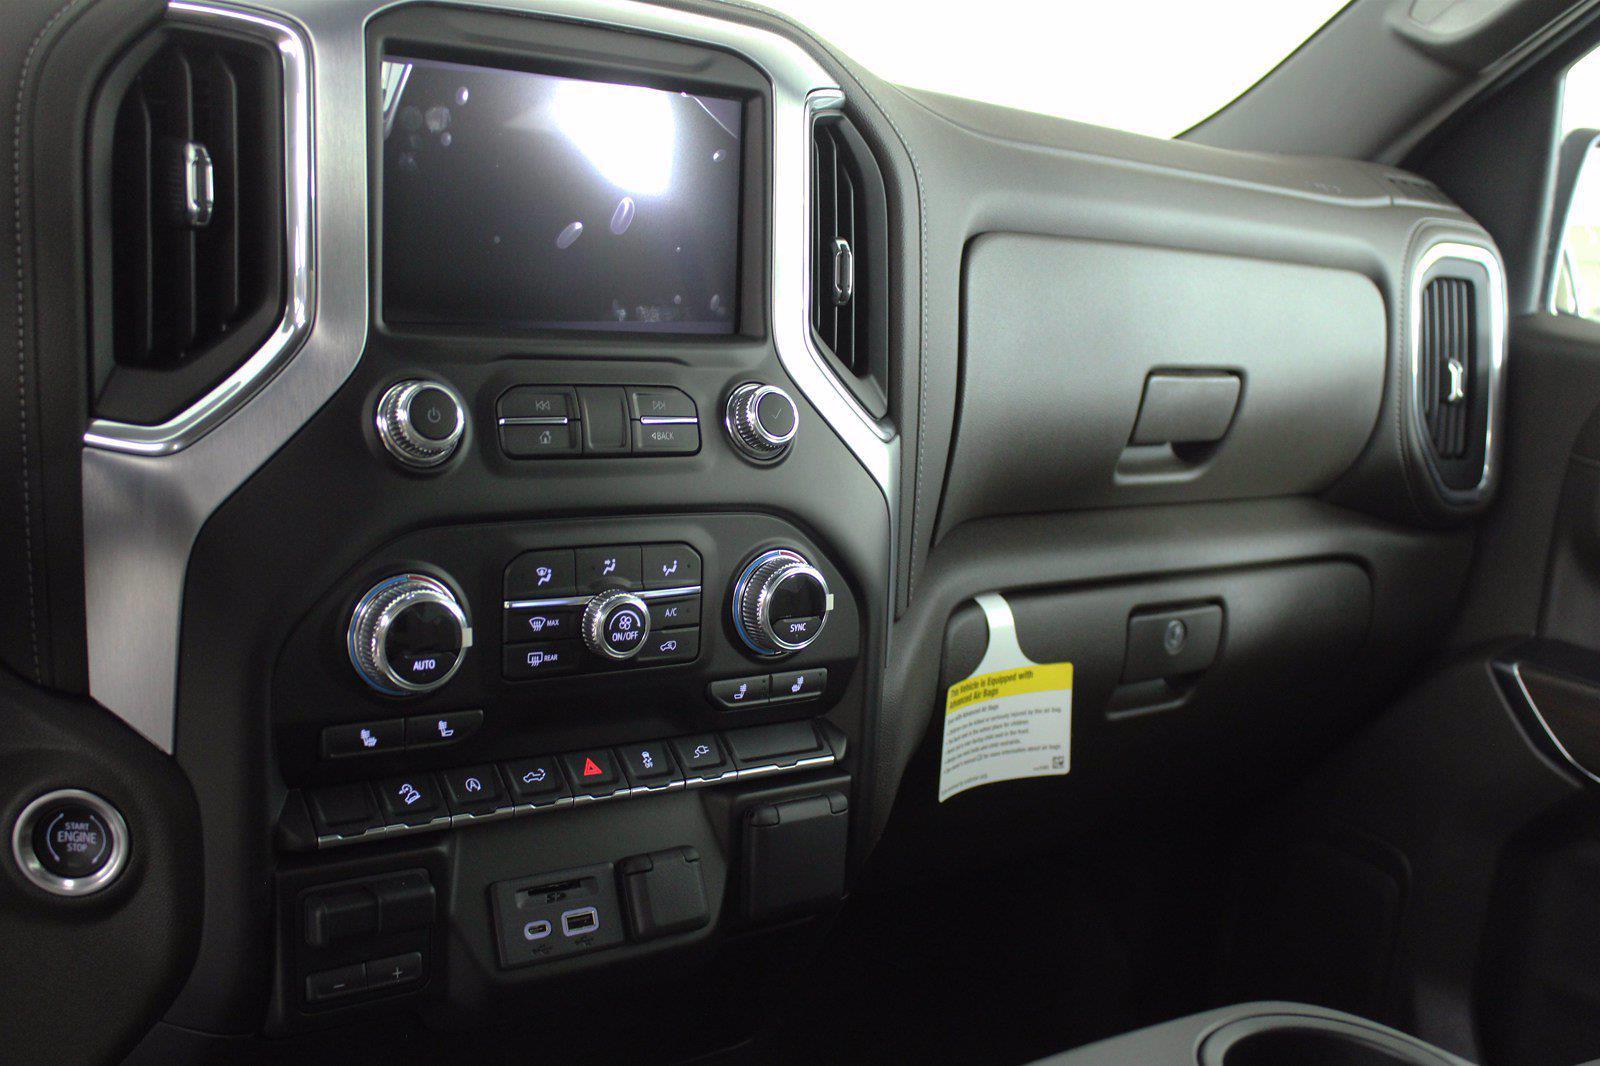 2021 GMC Sierra 1500 Crew Cab 4x4, Pickup #D411070 - photo 12